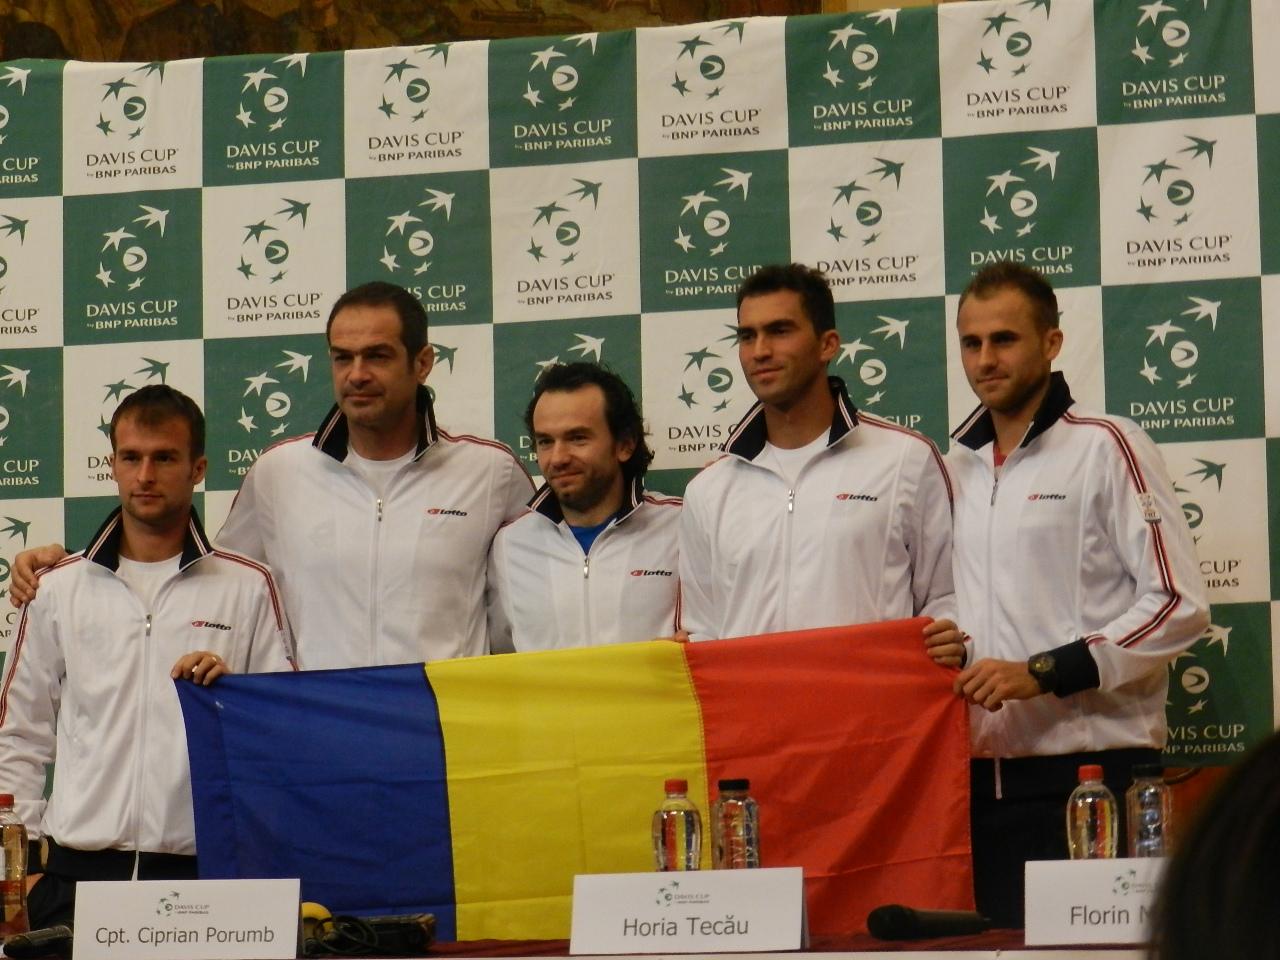 foto eClujeanul.ro